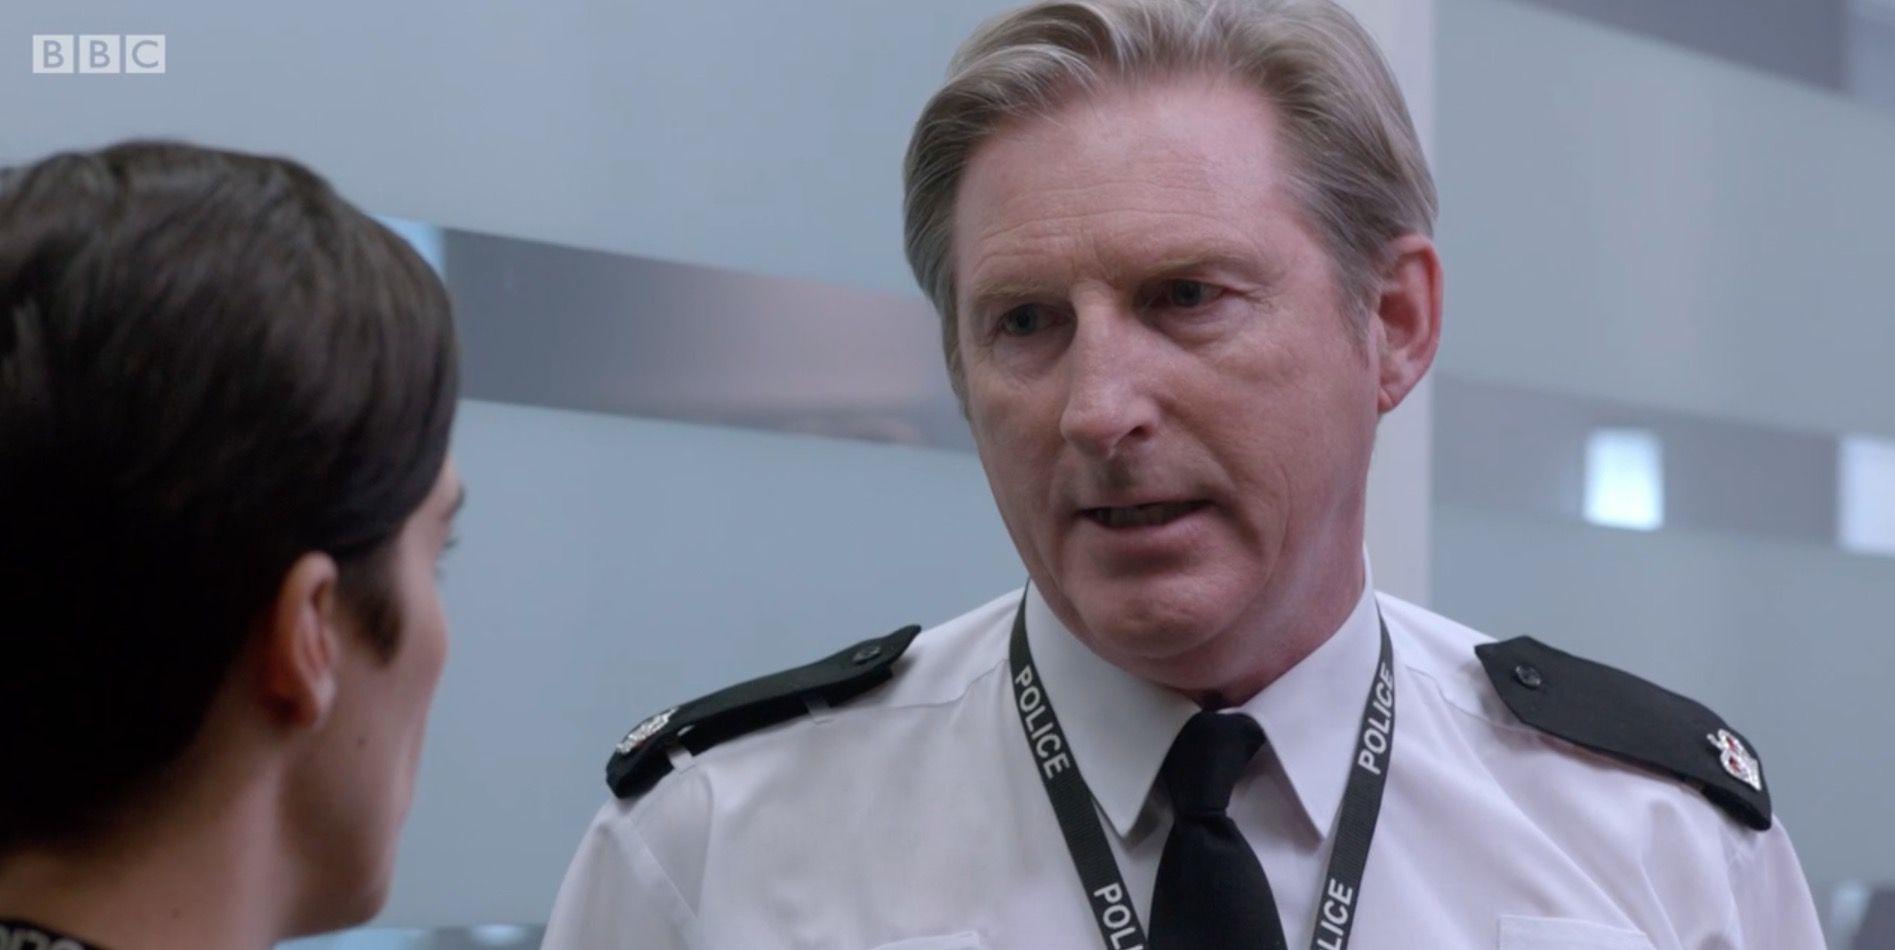 Ted Hastings in Line of Duty